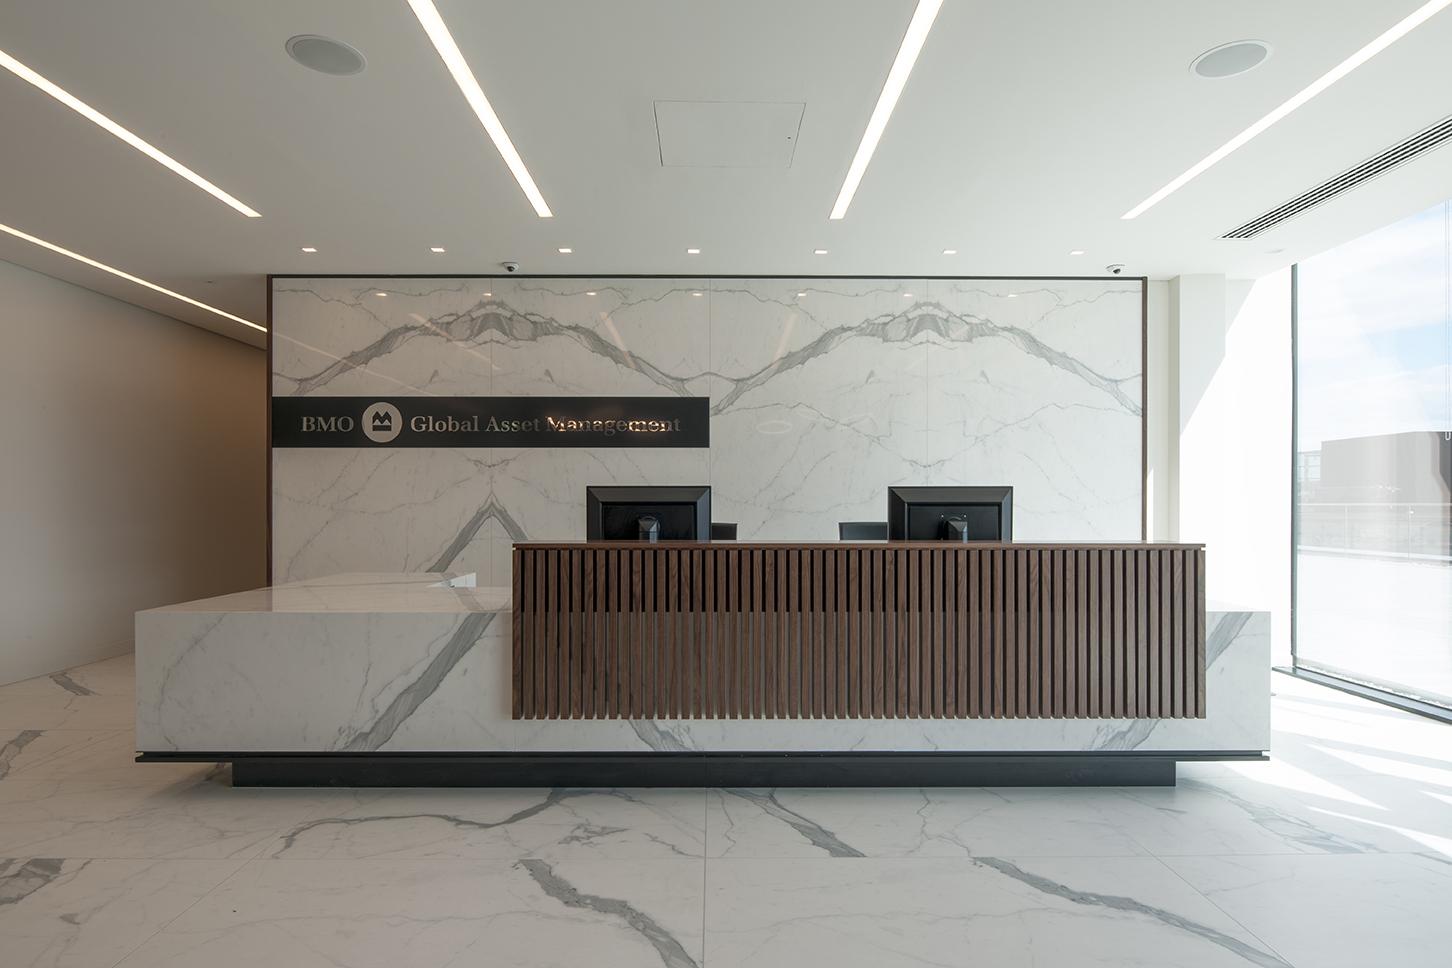 BANK OF MONTREAL – QUARTERMILE 4